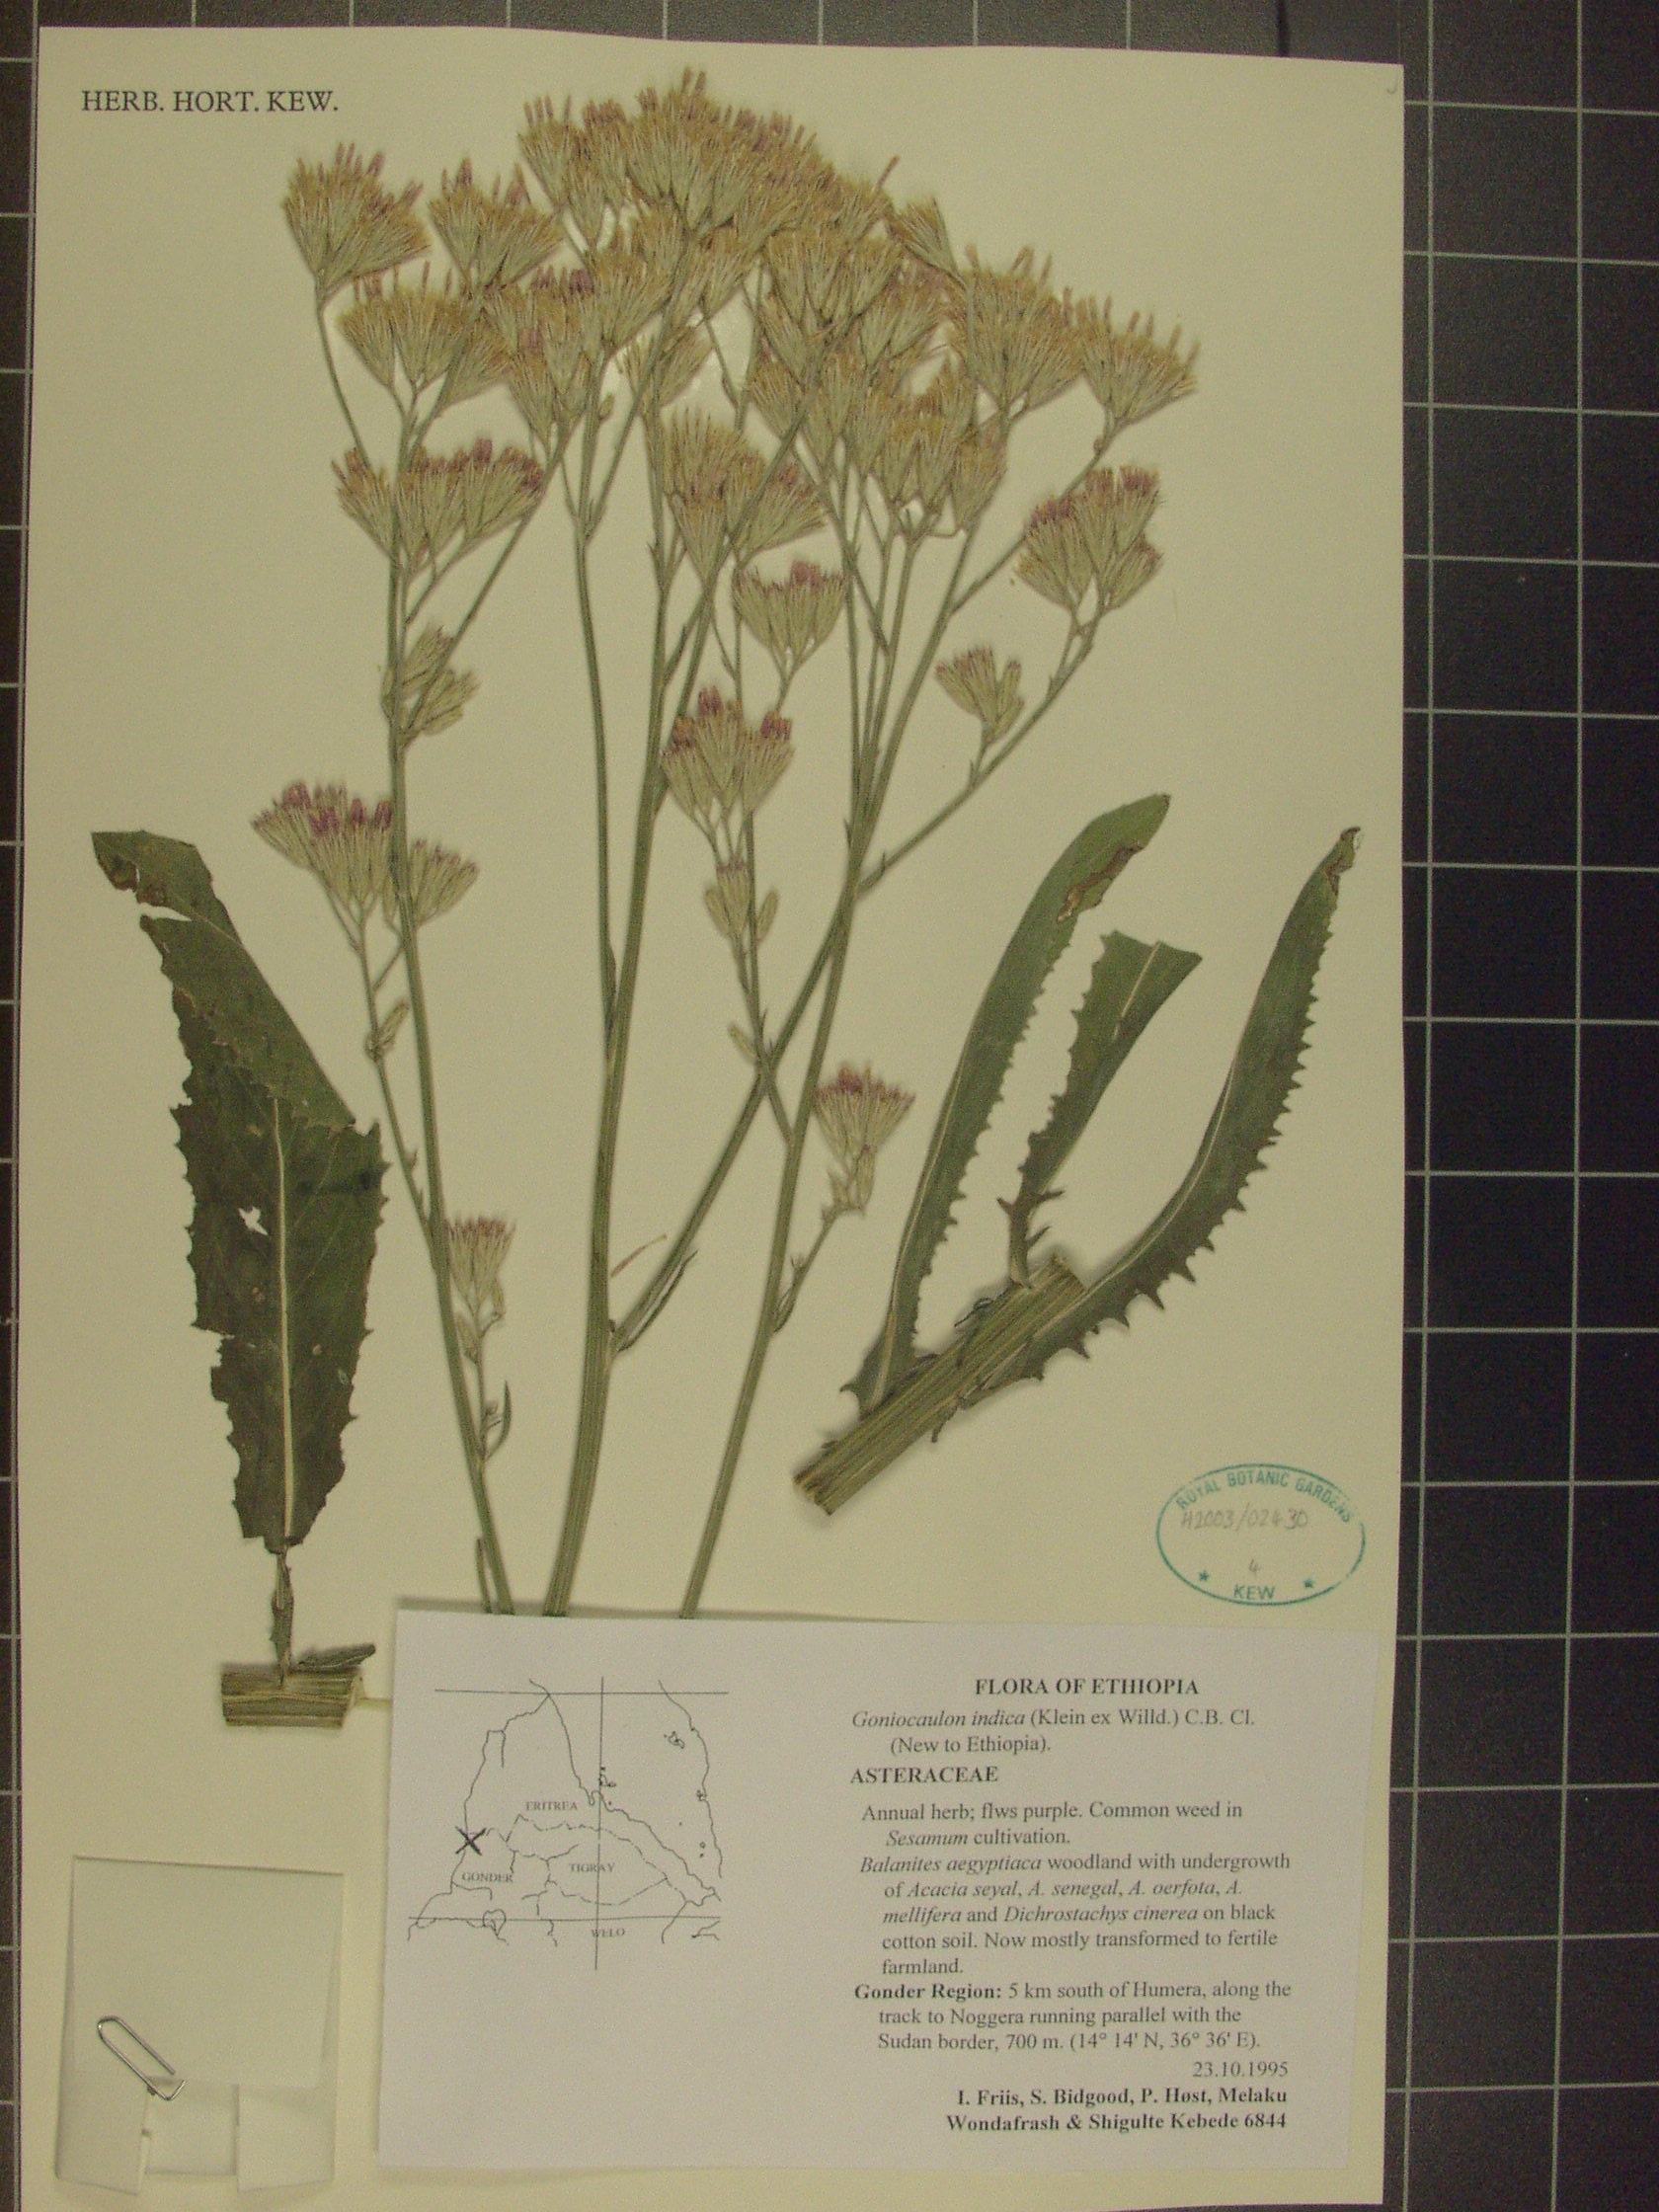 Plant: Goniocaulon